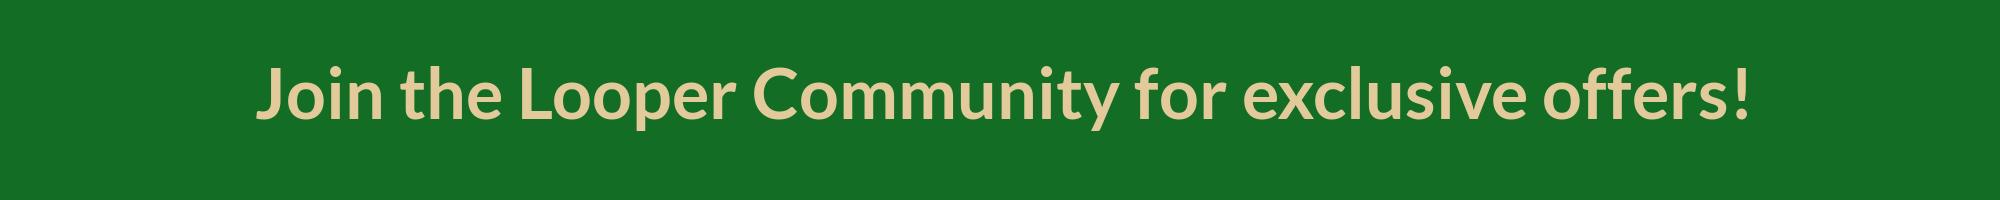 Looper Community Subscription